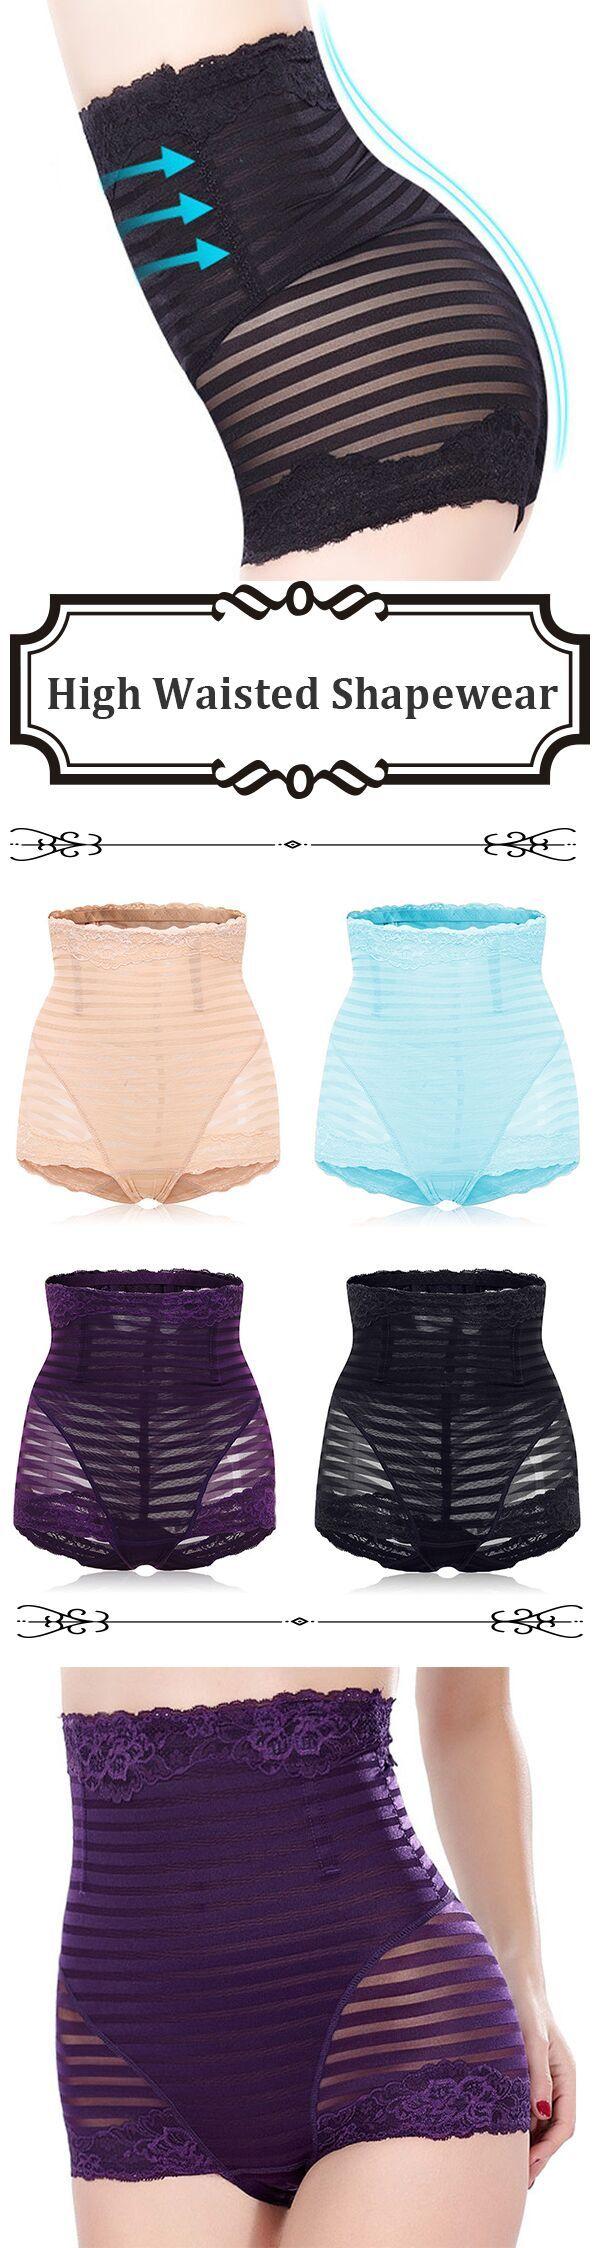 US$ 6.88 High Waisted Tummy Tuck Solid Color Shapewear Briefs Underwear